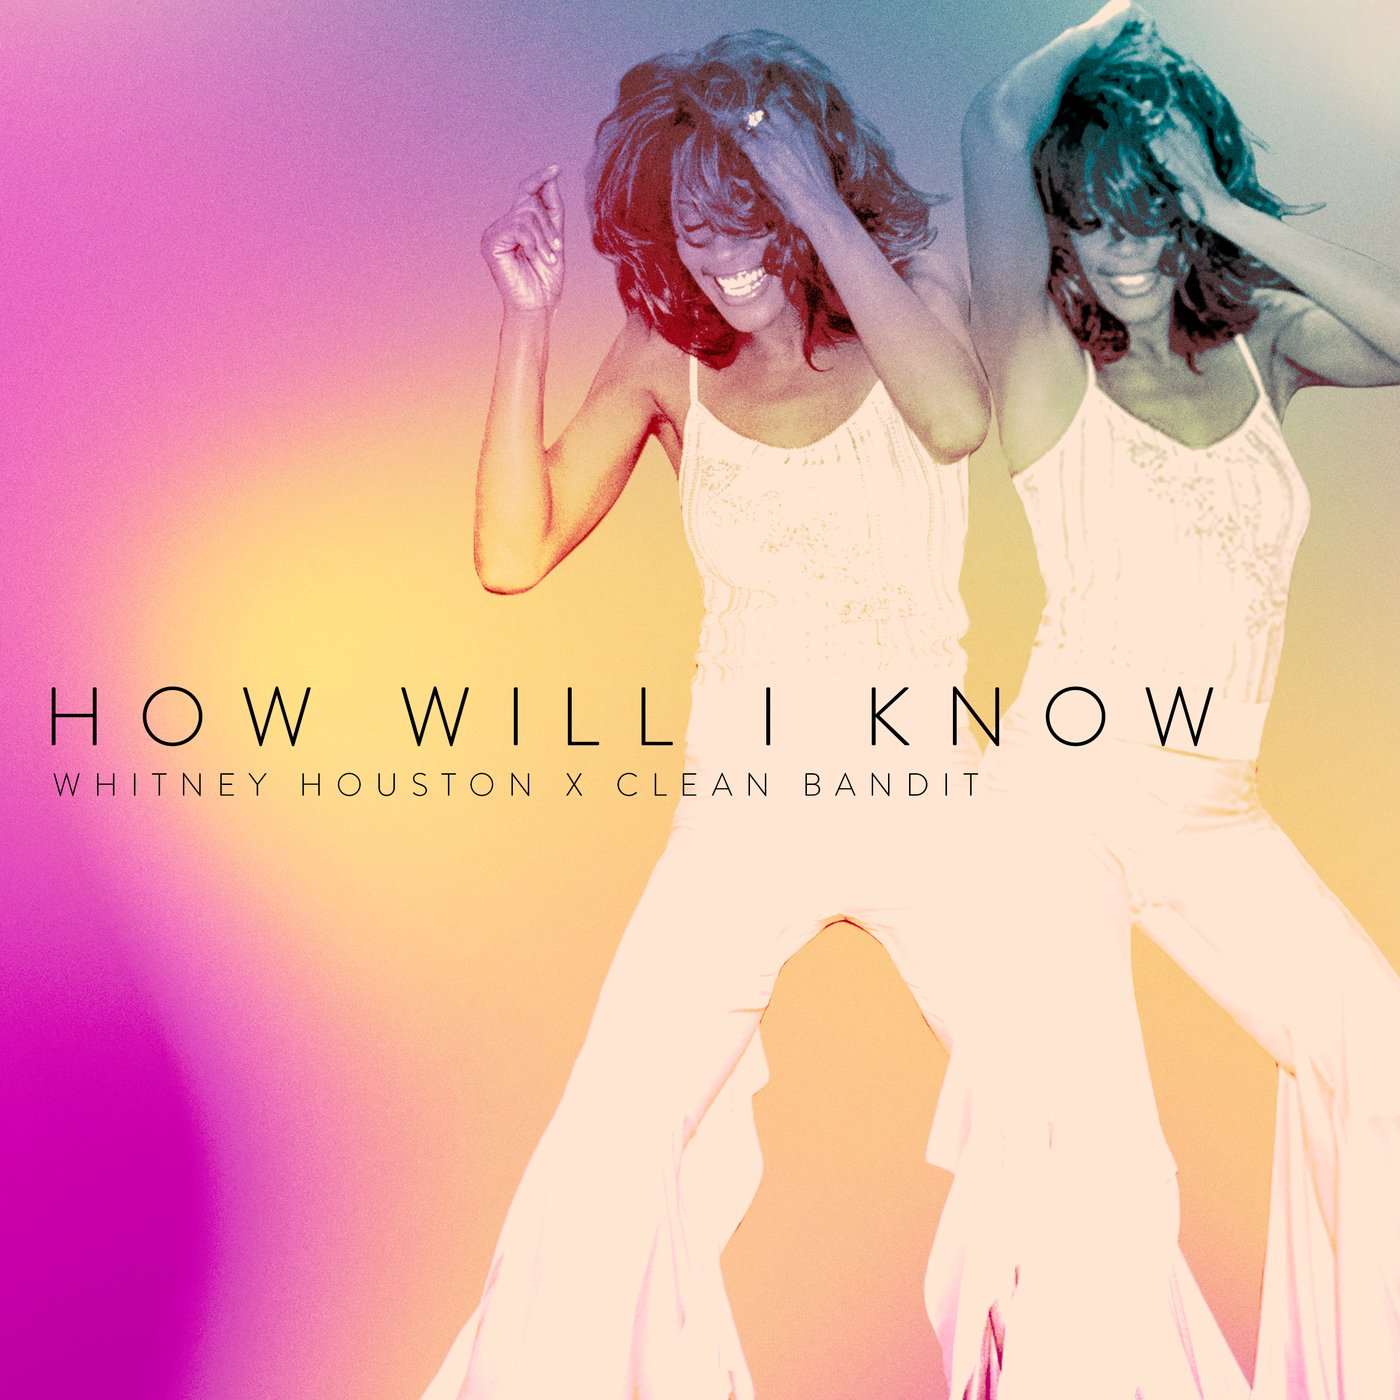 Whitney Houston & Clean Bandit